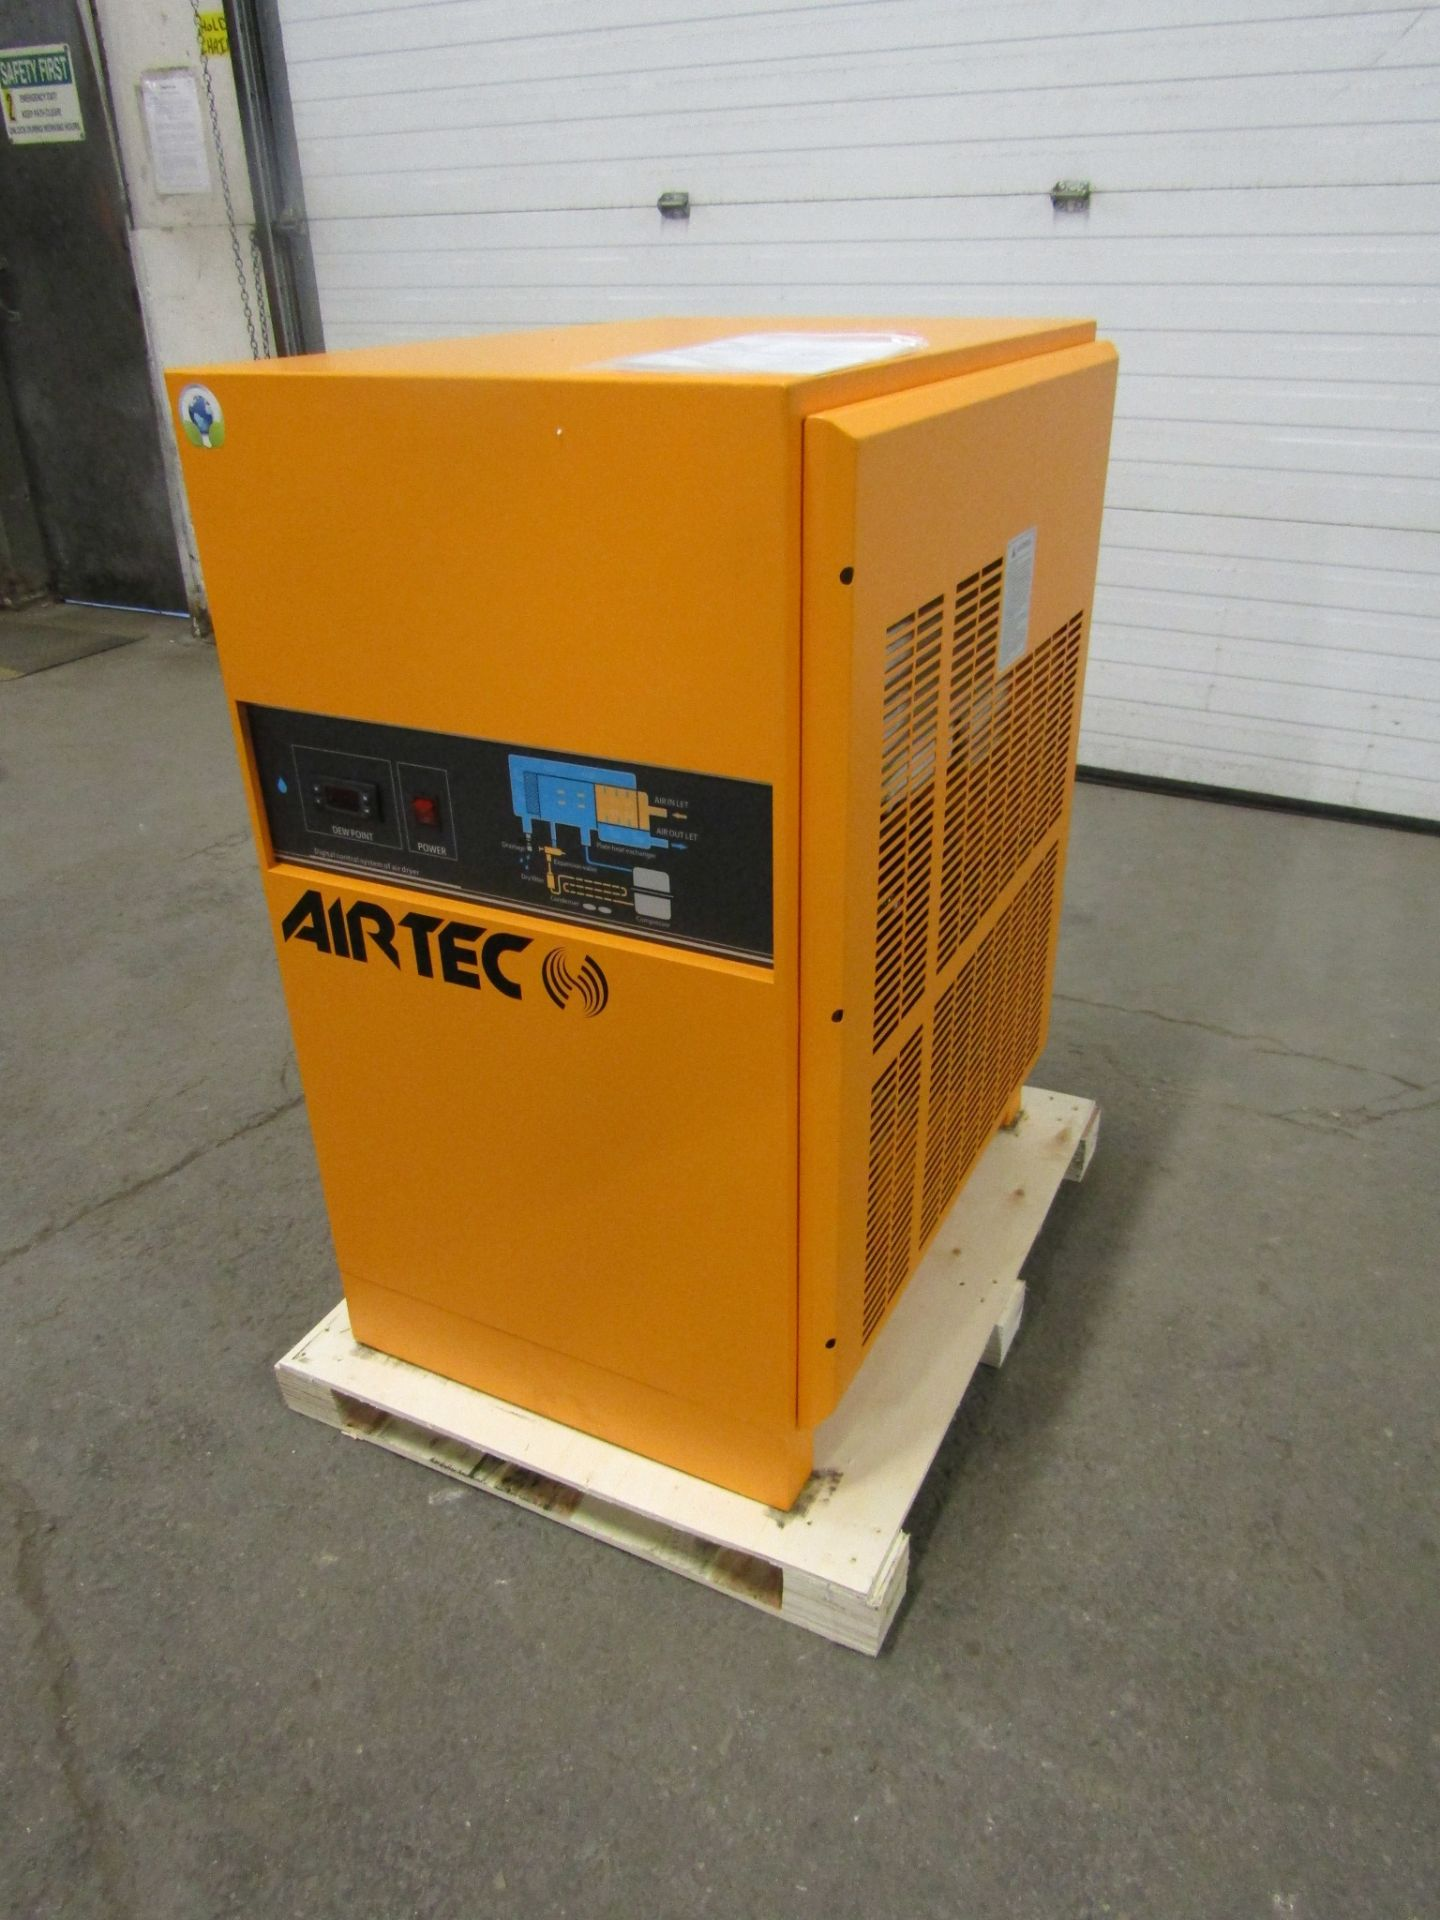 Lot 258 - MINT Airtec Compressed Air Dryer 476 CFM UNUSED / NEW unit